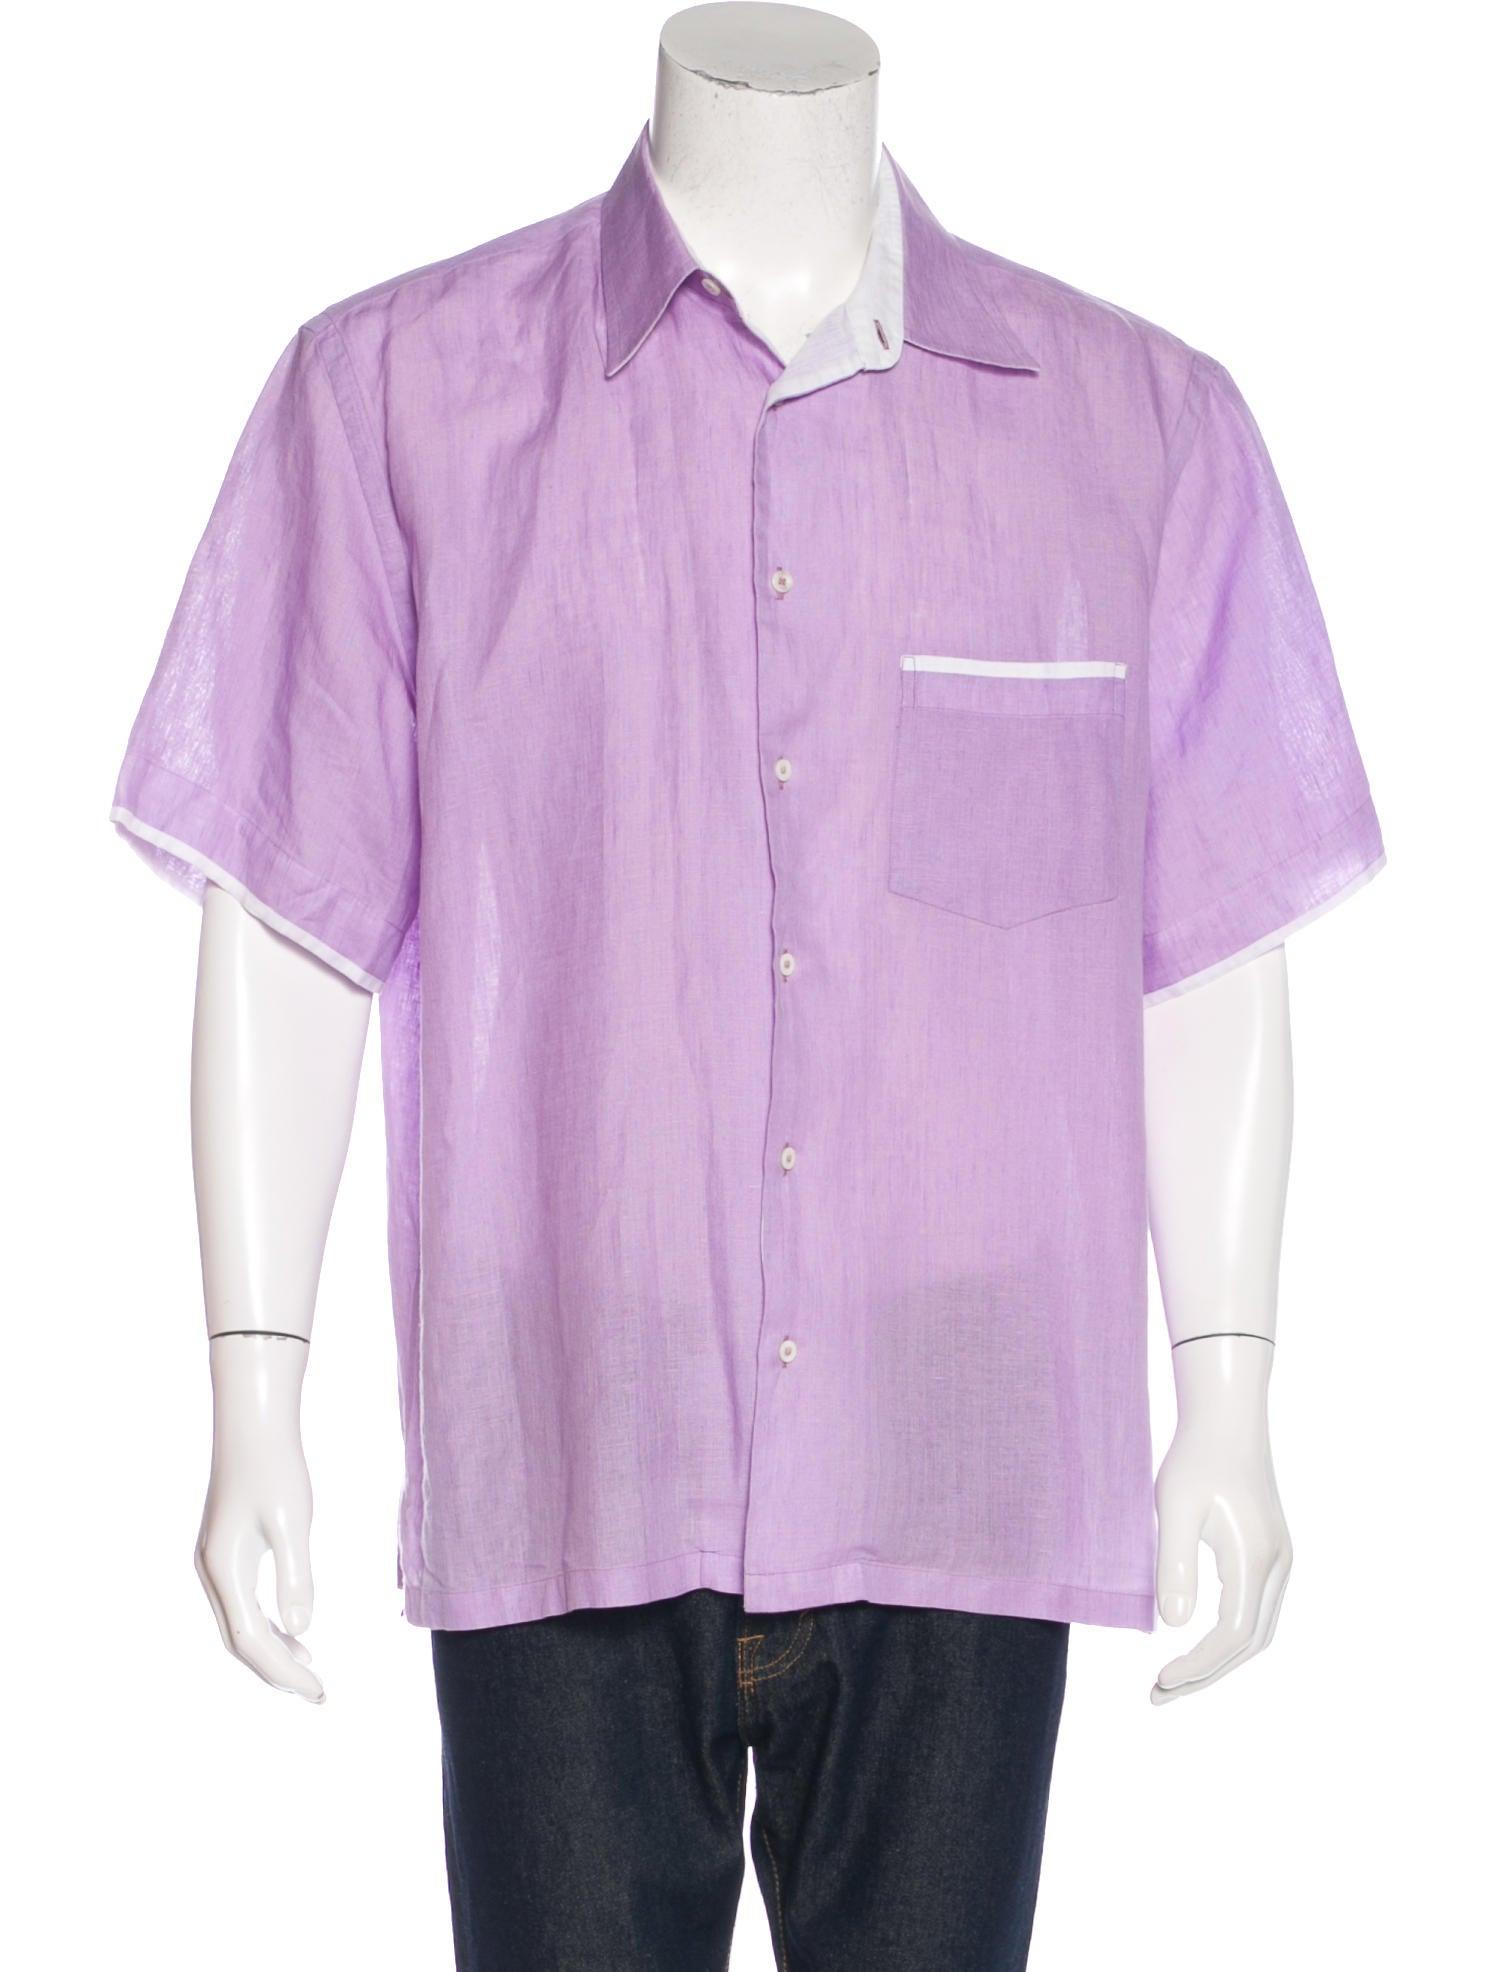 Brioni linen short sleeve shirt clothing bro21884 for Short sleeve linen shirt